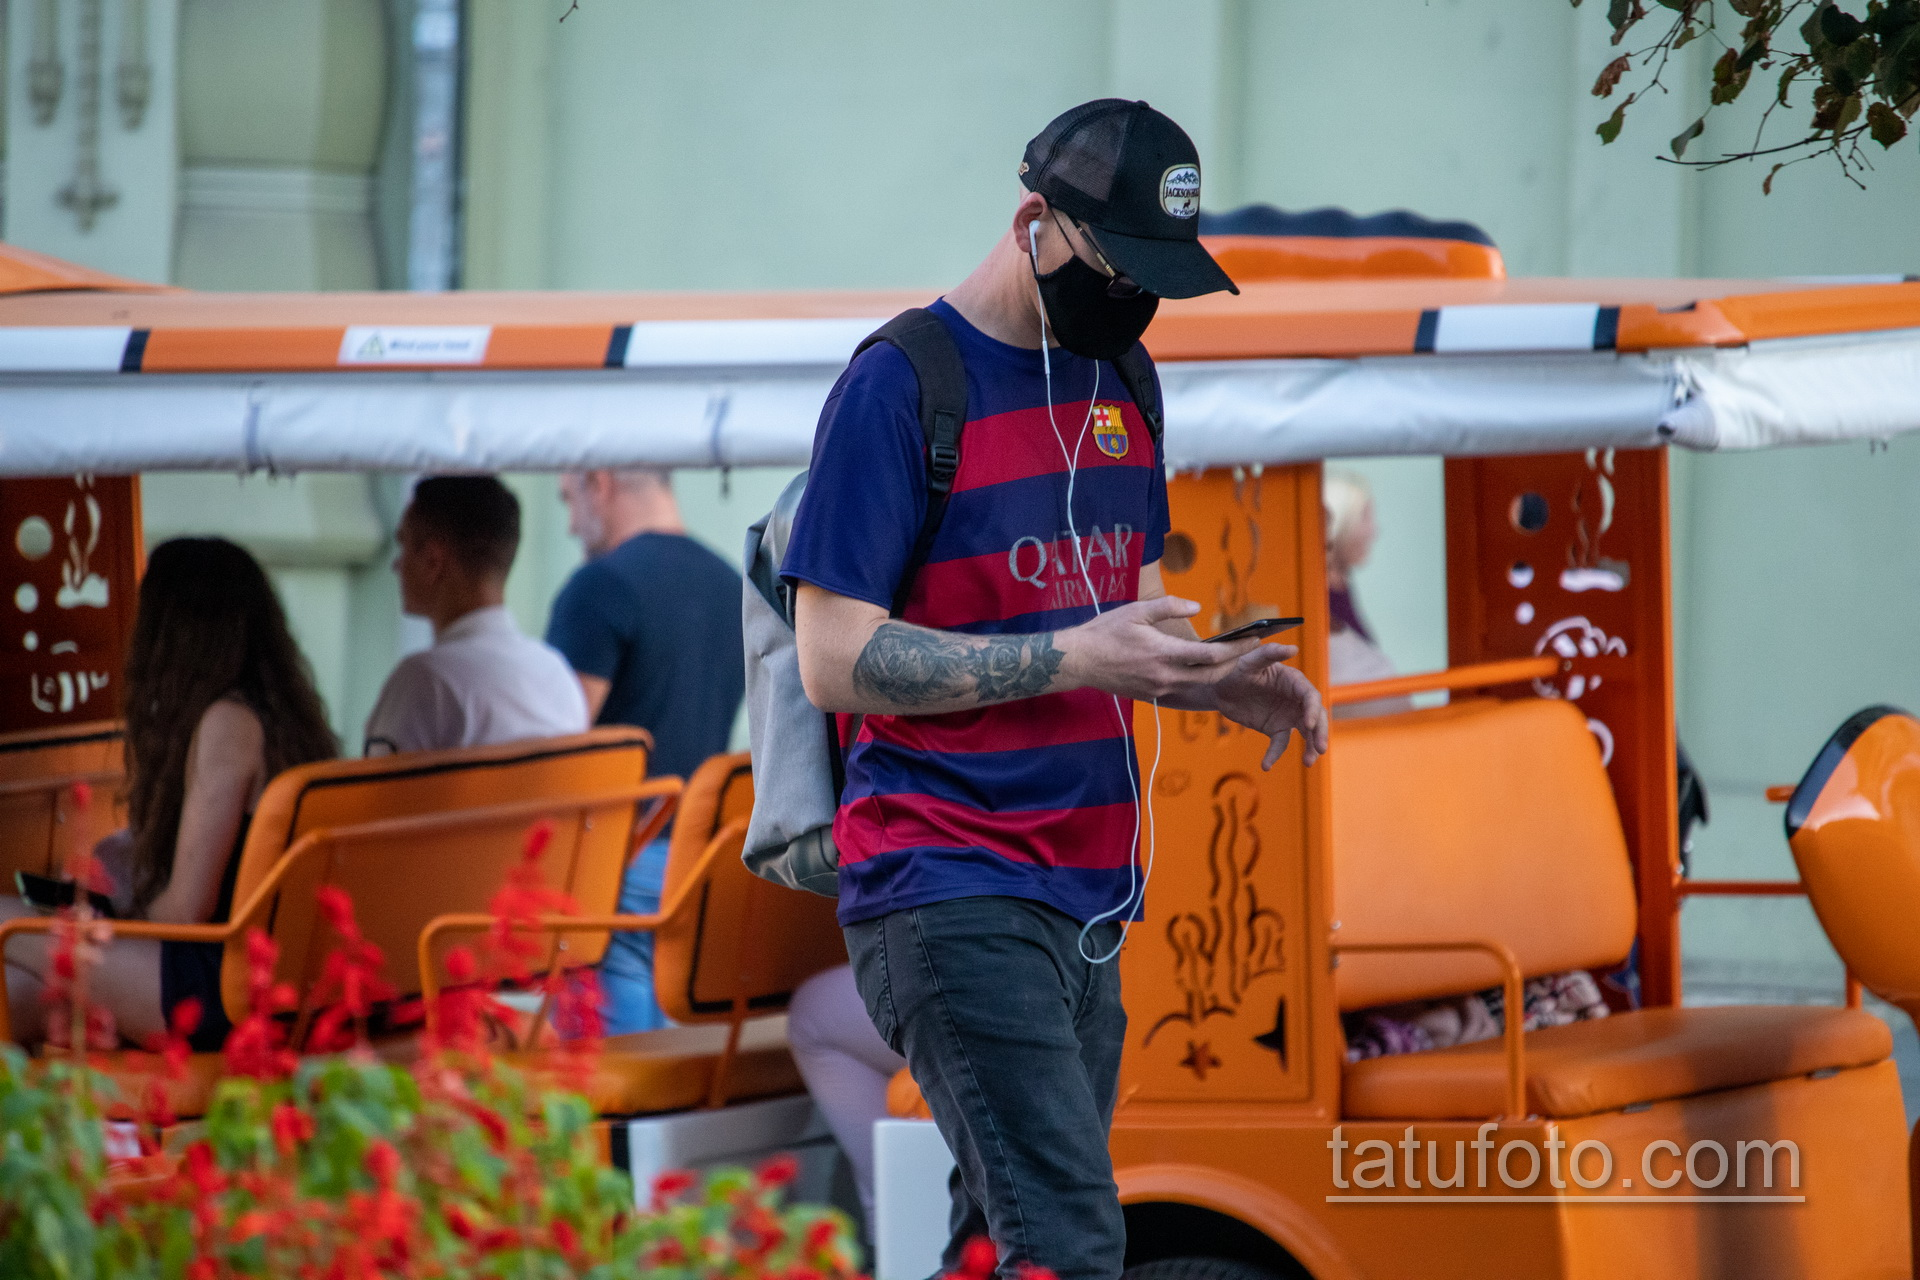 Тату девушка Санта Муэрто и роза на руке парня – Уличная татуировка 14.09.2020 – tatufoto.com 7